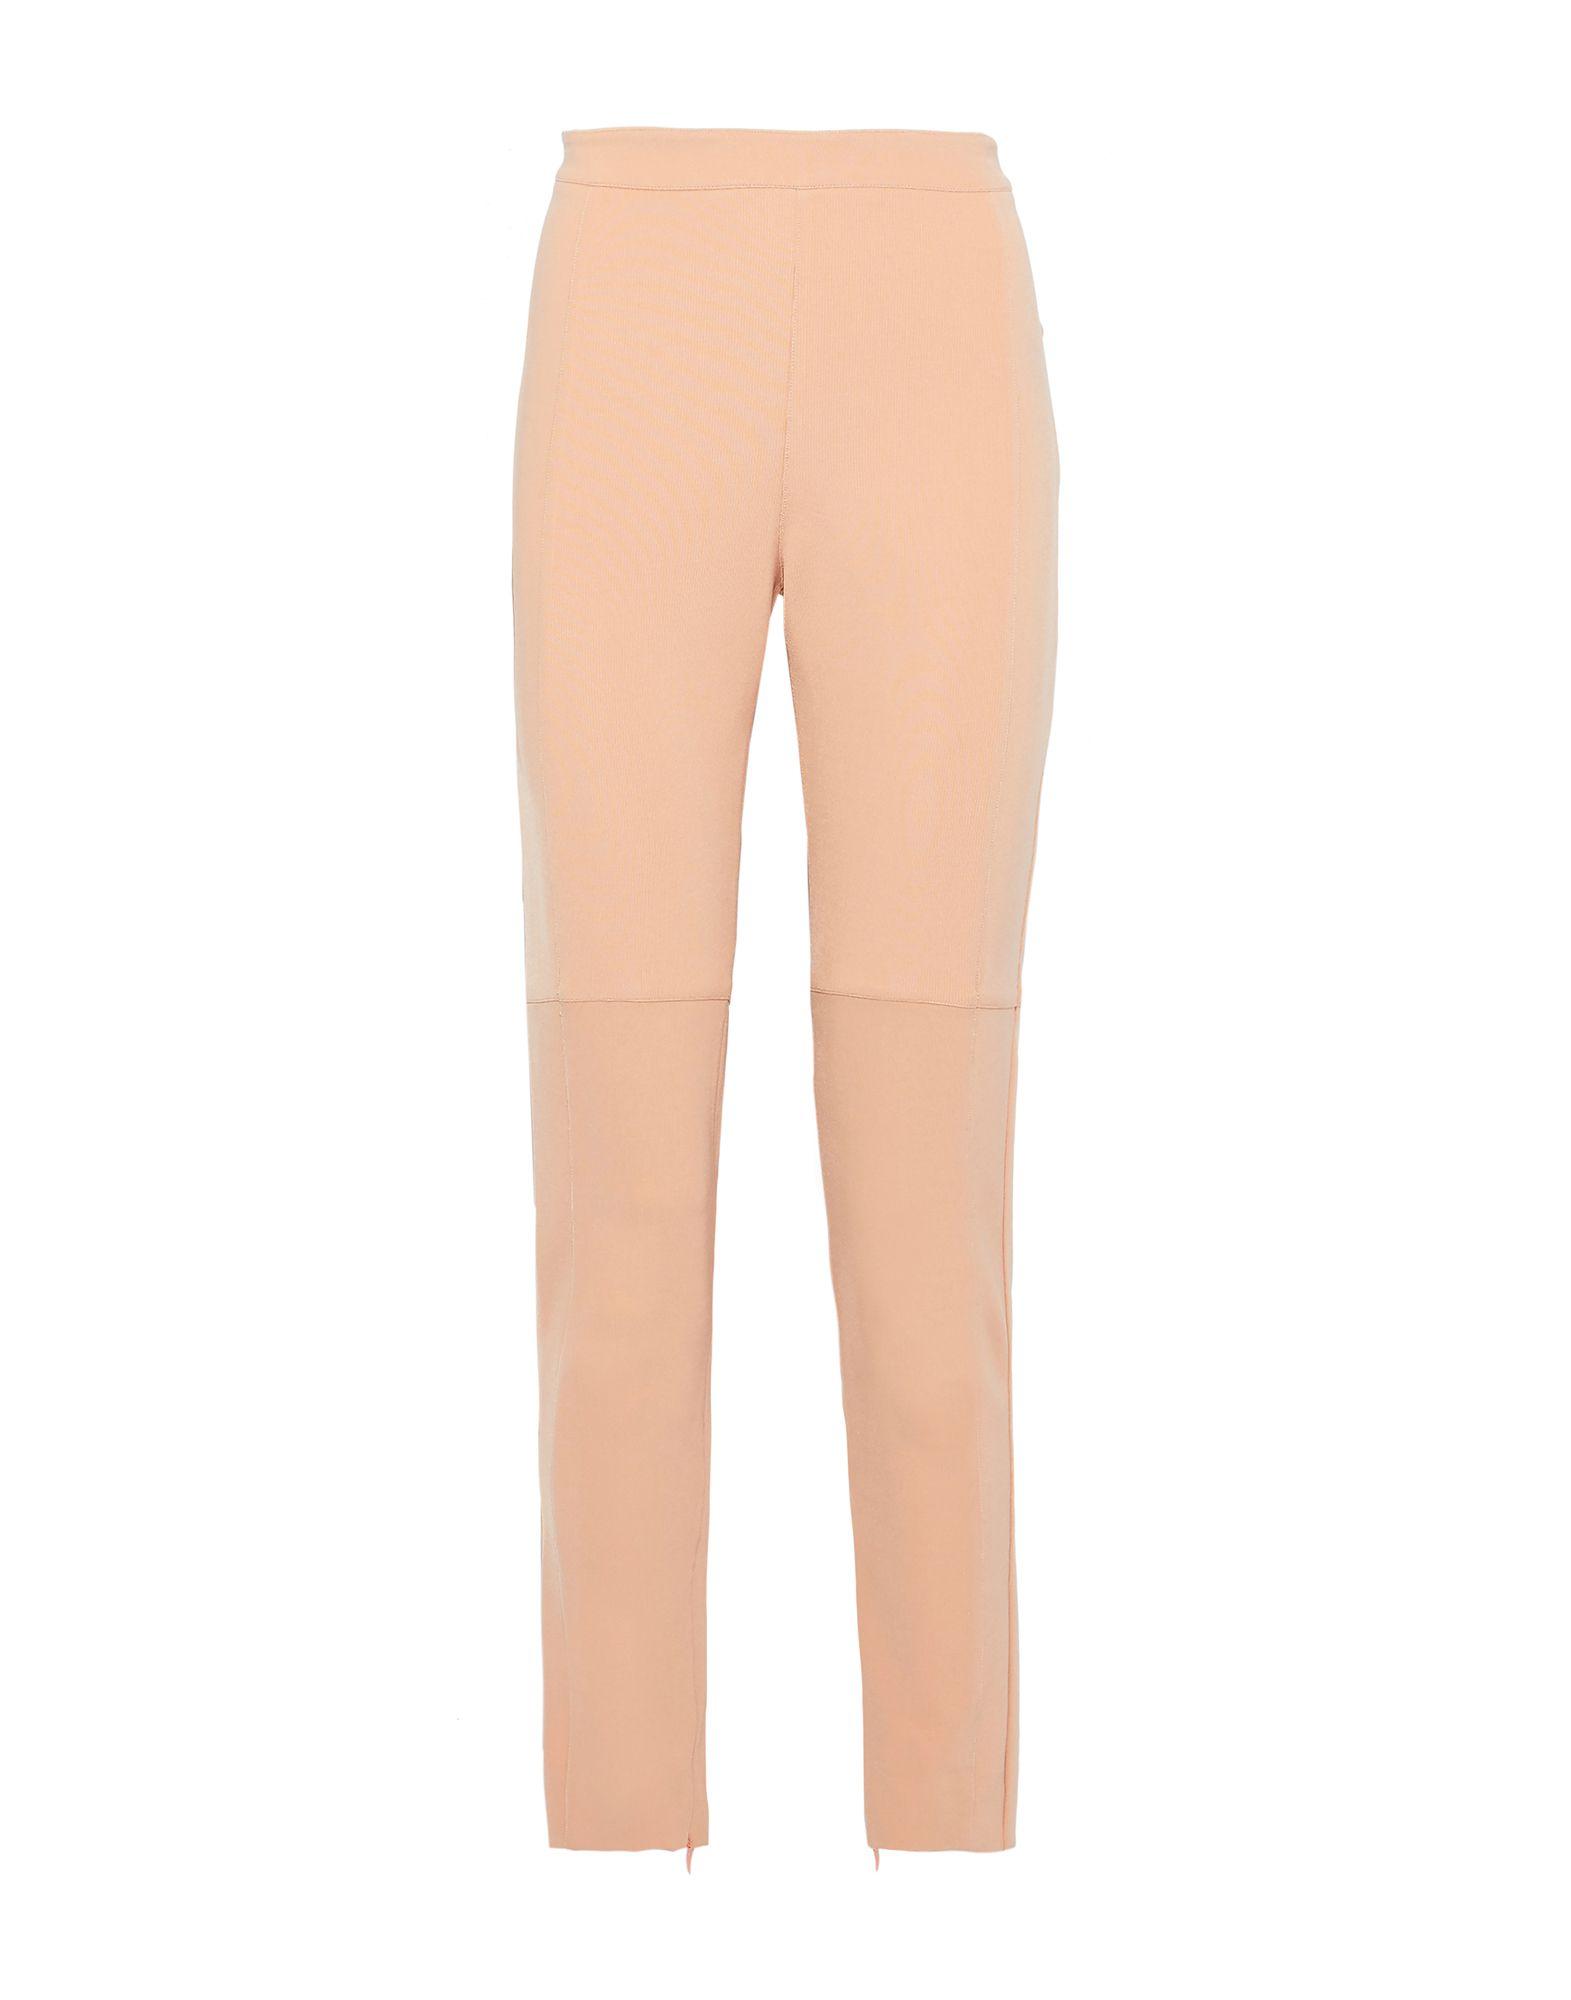 Pantalone Jonathan Simkhai donna donna donna - 13334155HF 09b